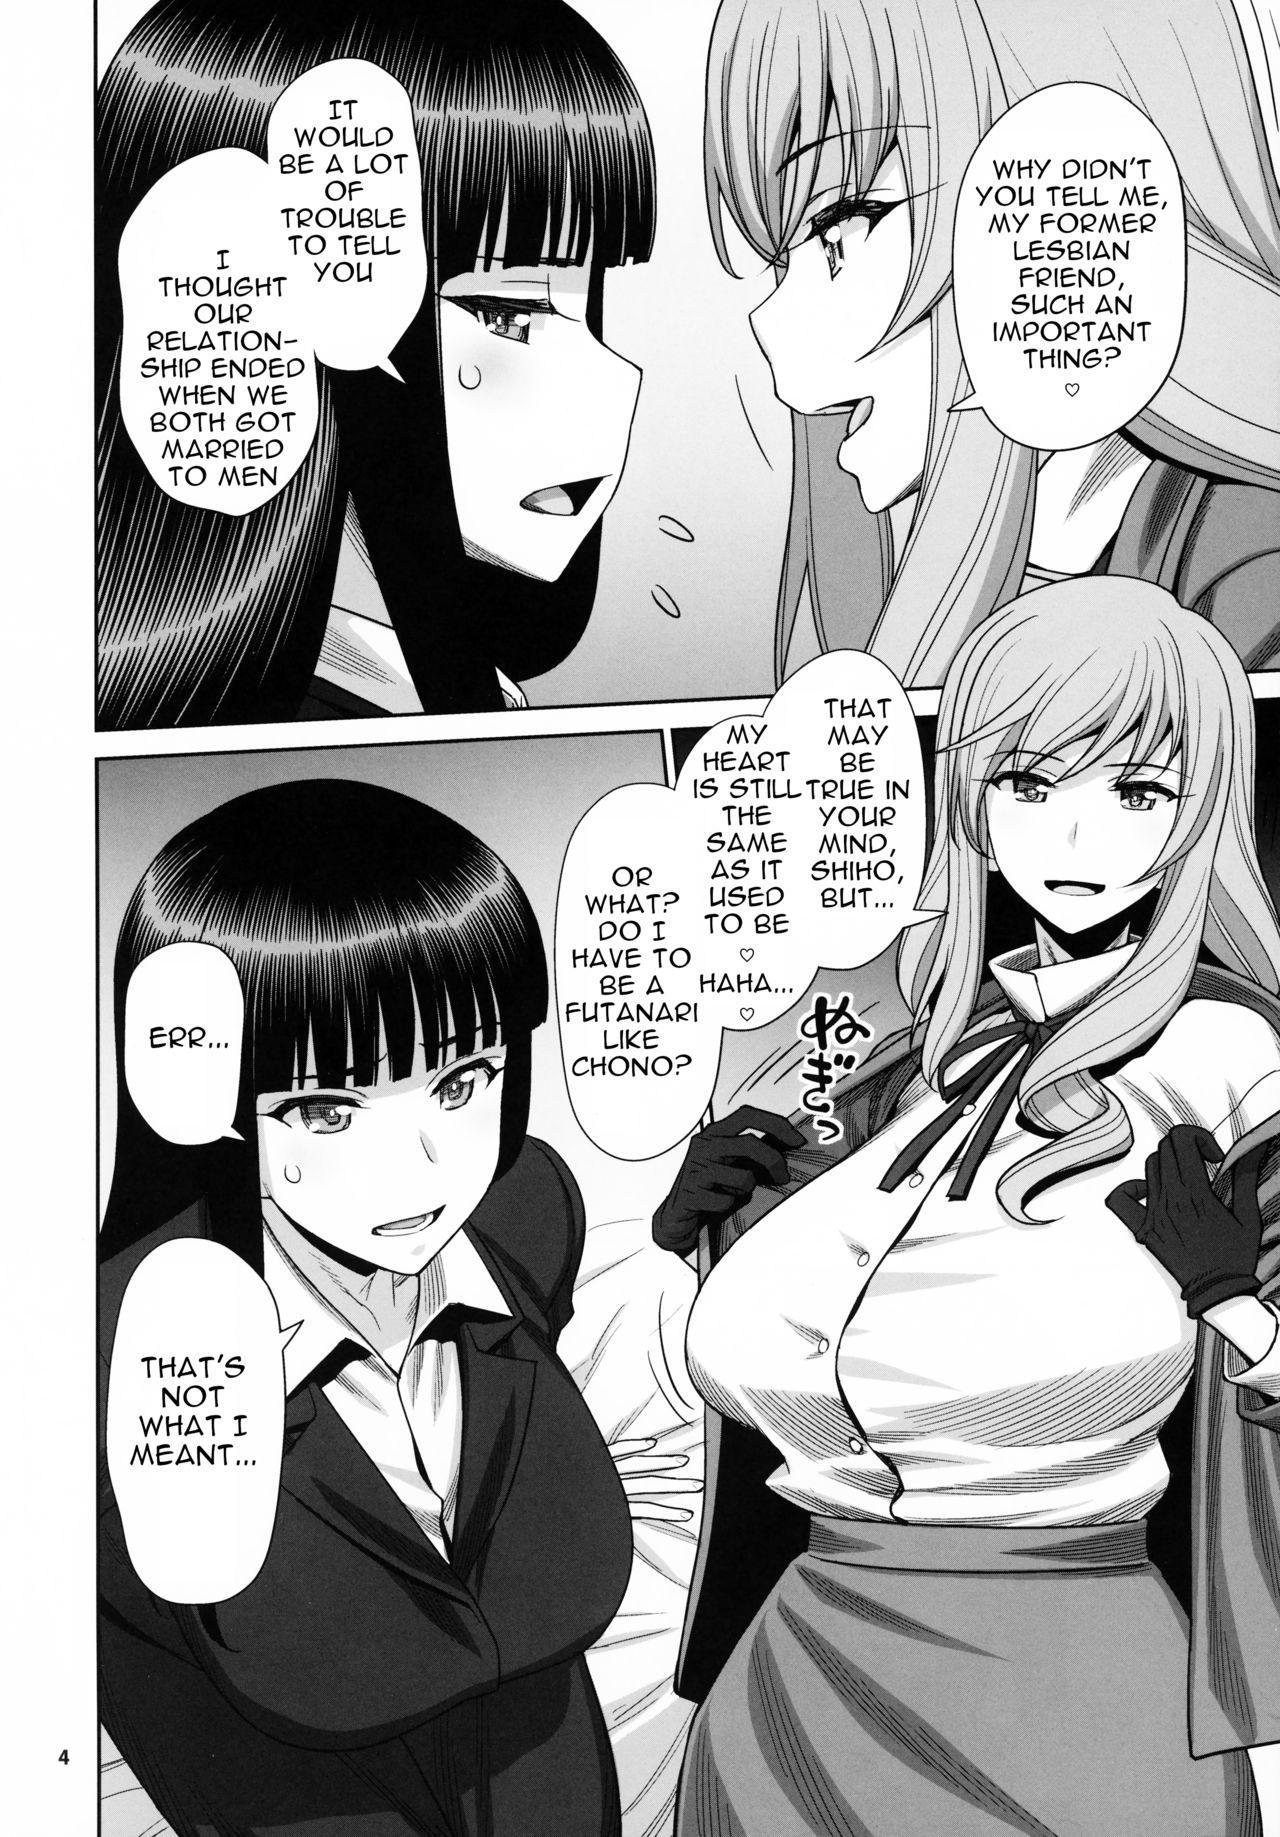 (COMIC1☆15) [Gerupin (Minazuki Juuzou, USSO)] Shimada-ryuu VS Nishizumi-ryuu Bijukujo Lesbian Kyokugen Kougyaku Gurui | Shimada Style VS Nishizumi Style MILF Lesbian Extreme Anal Fetish (Girls und Panzer) [English] 2